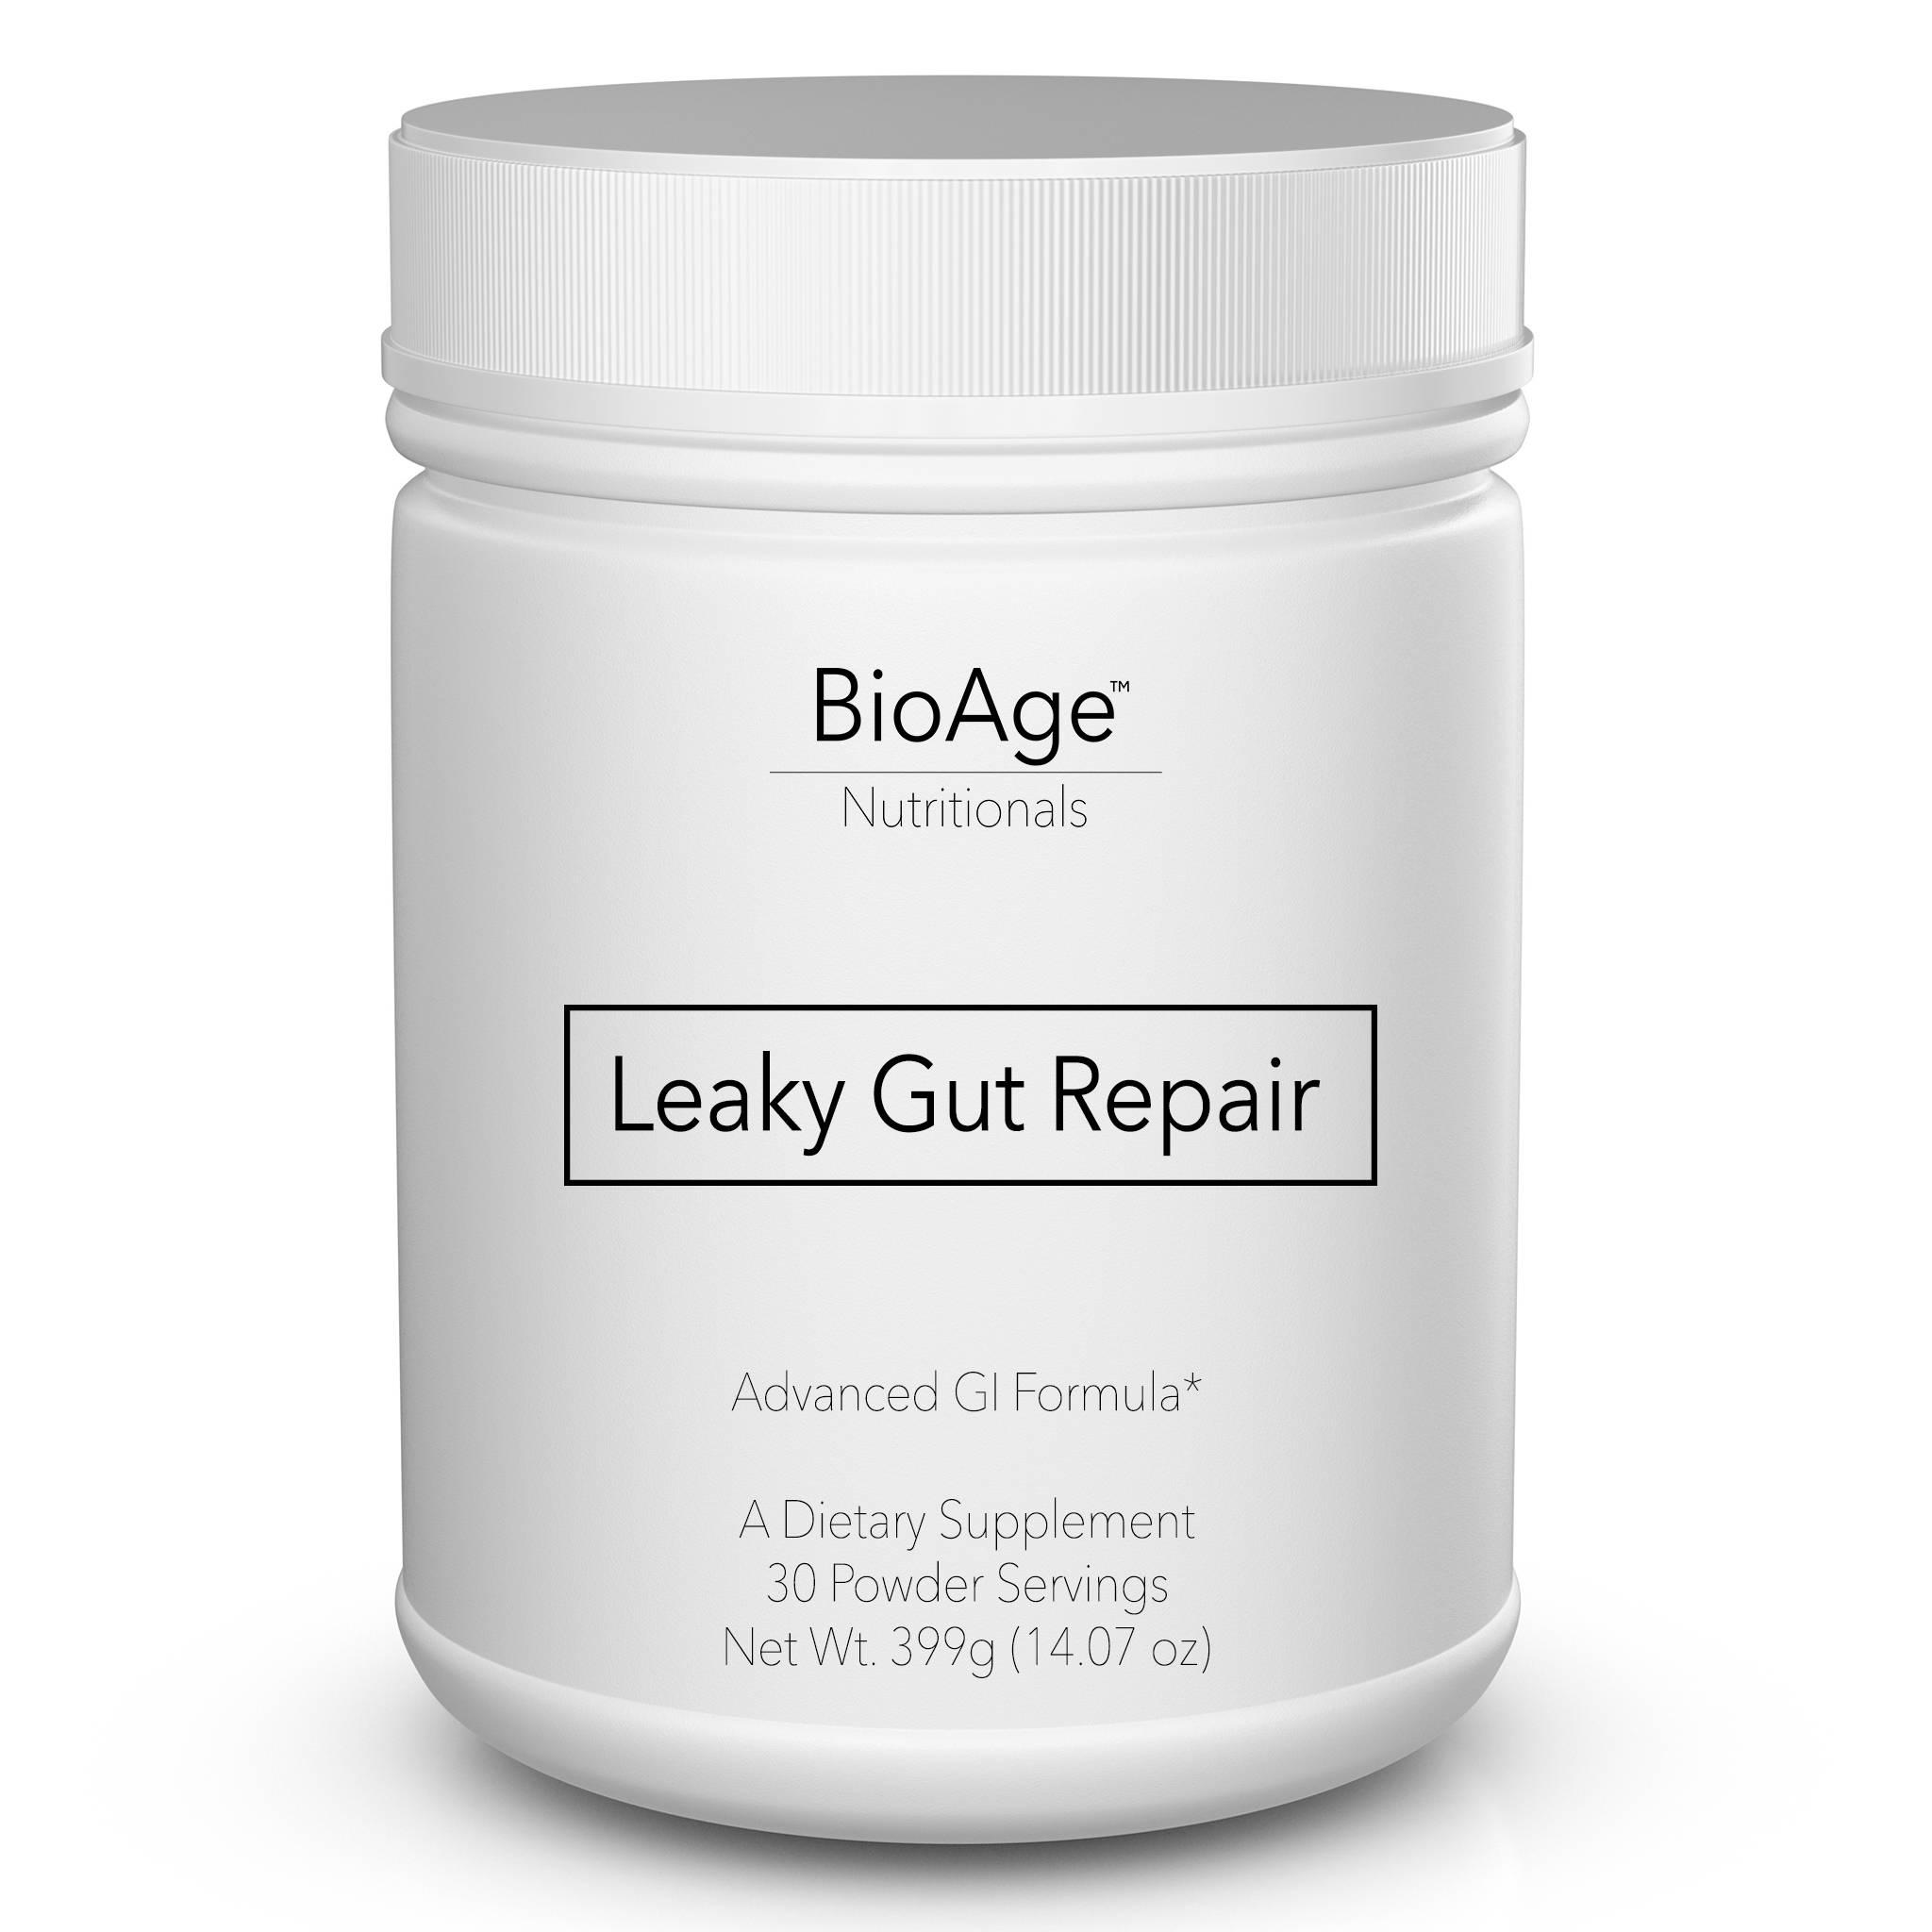 Leaky Gut Repair Powder